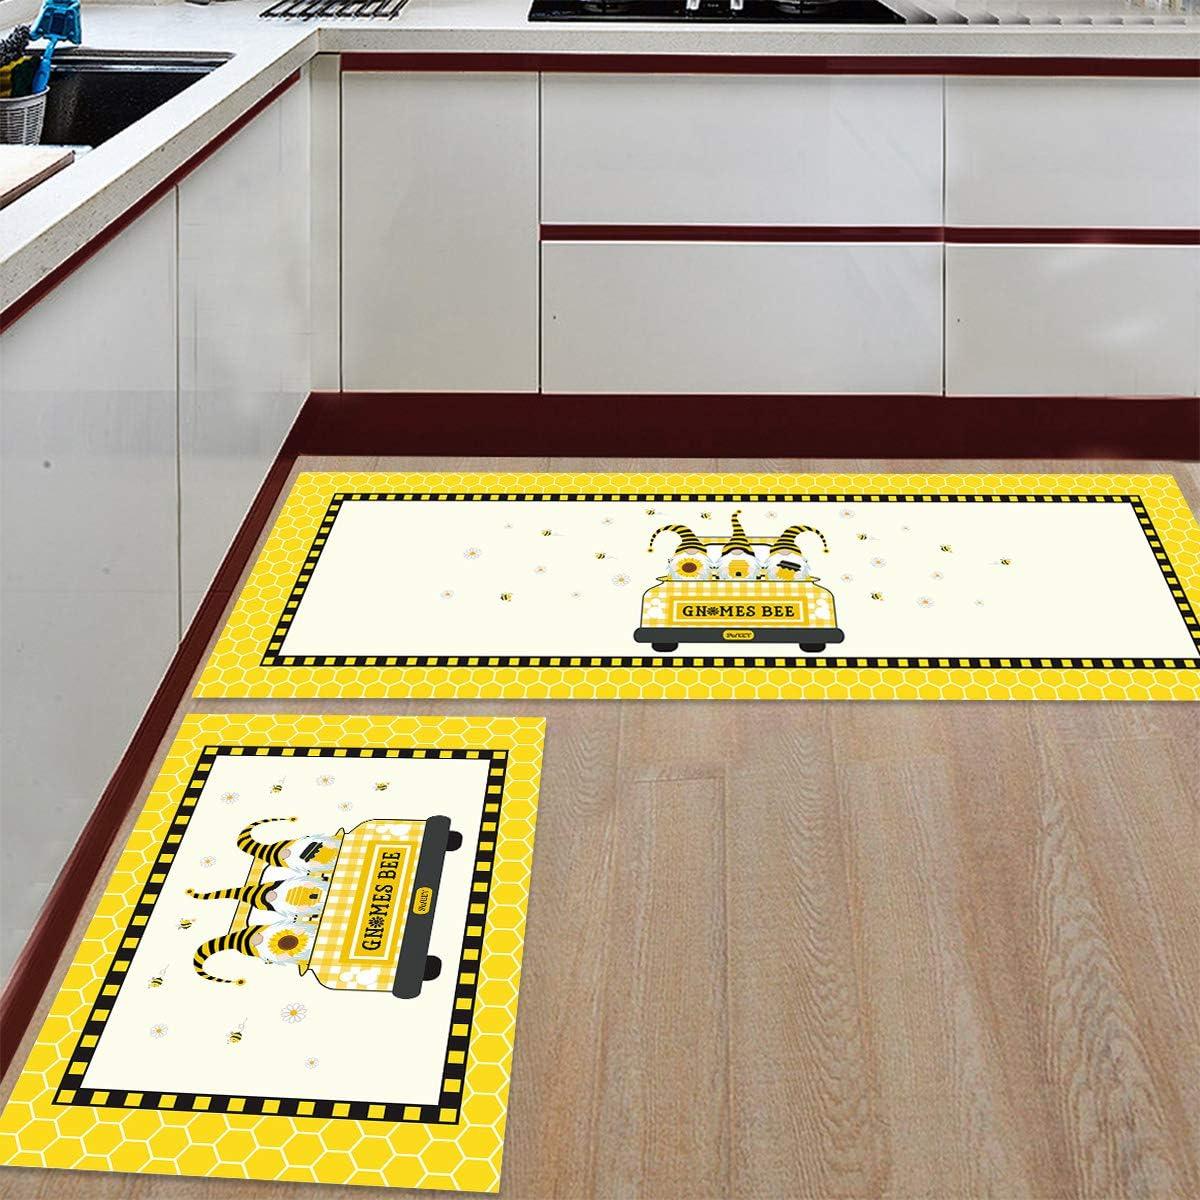 Kitchen Mat Set Anti-WearNon-Slip specialty shop Floor Rug Ranking TOP5 Microf Pieces 2